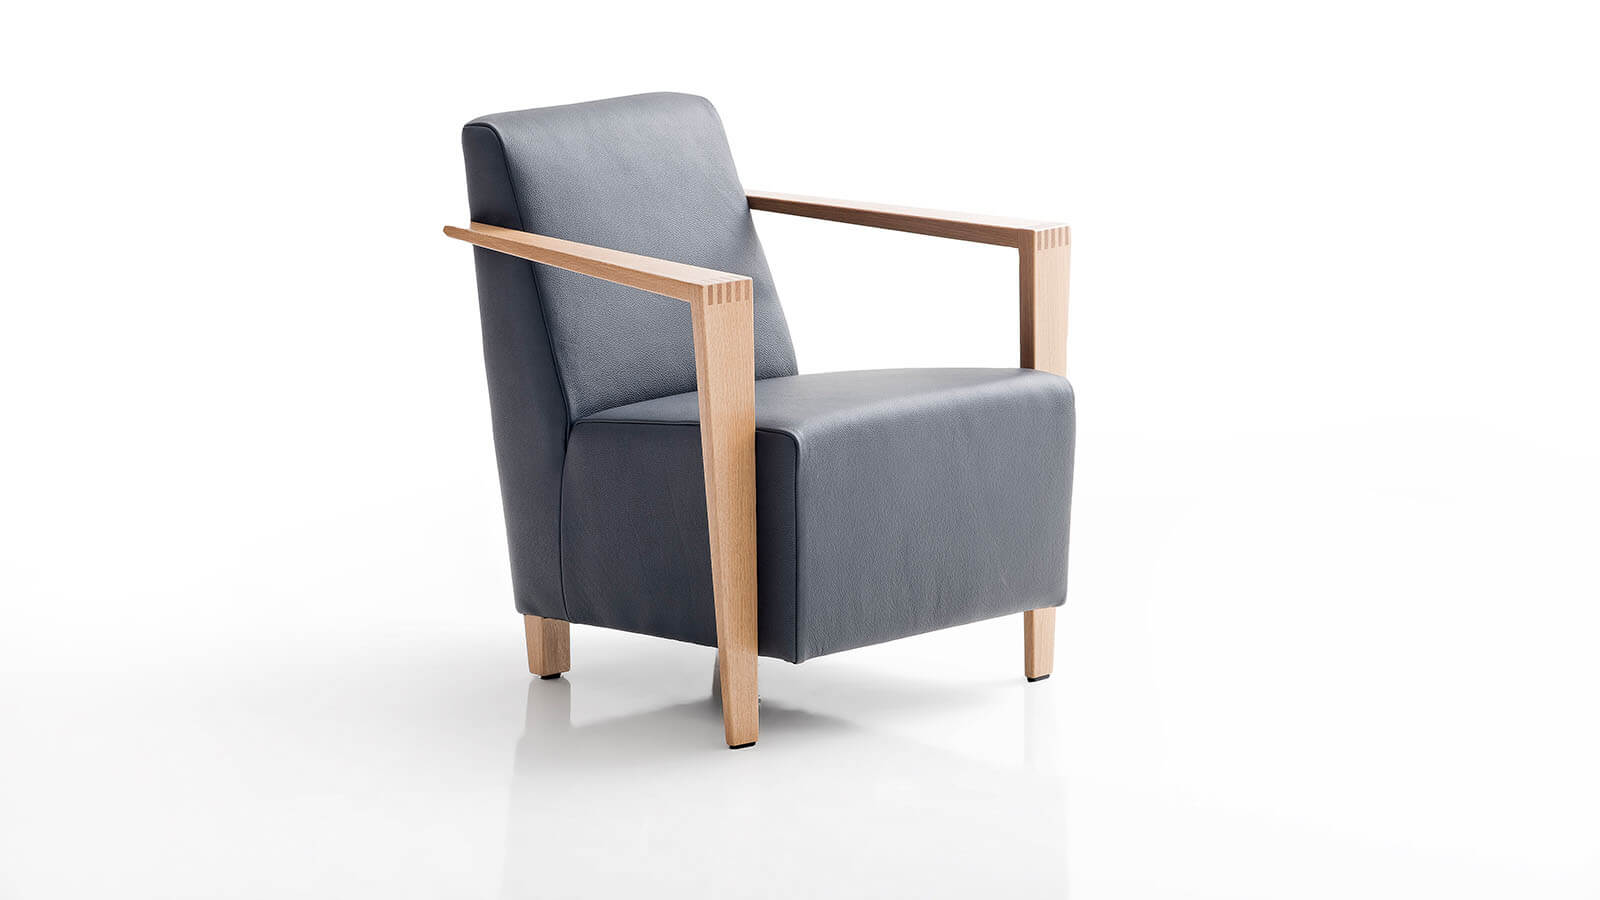 relaxsessel dresden von franz fertig. Black Bedroom Furniture Sets. Home Design Ideas